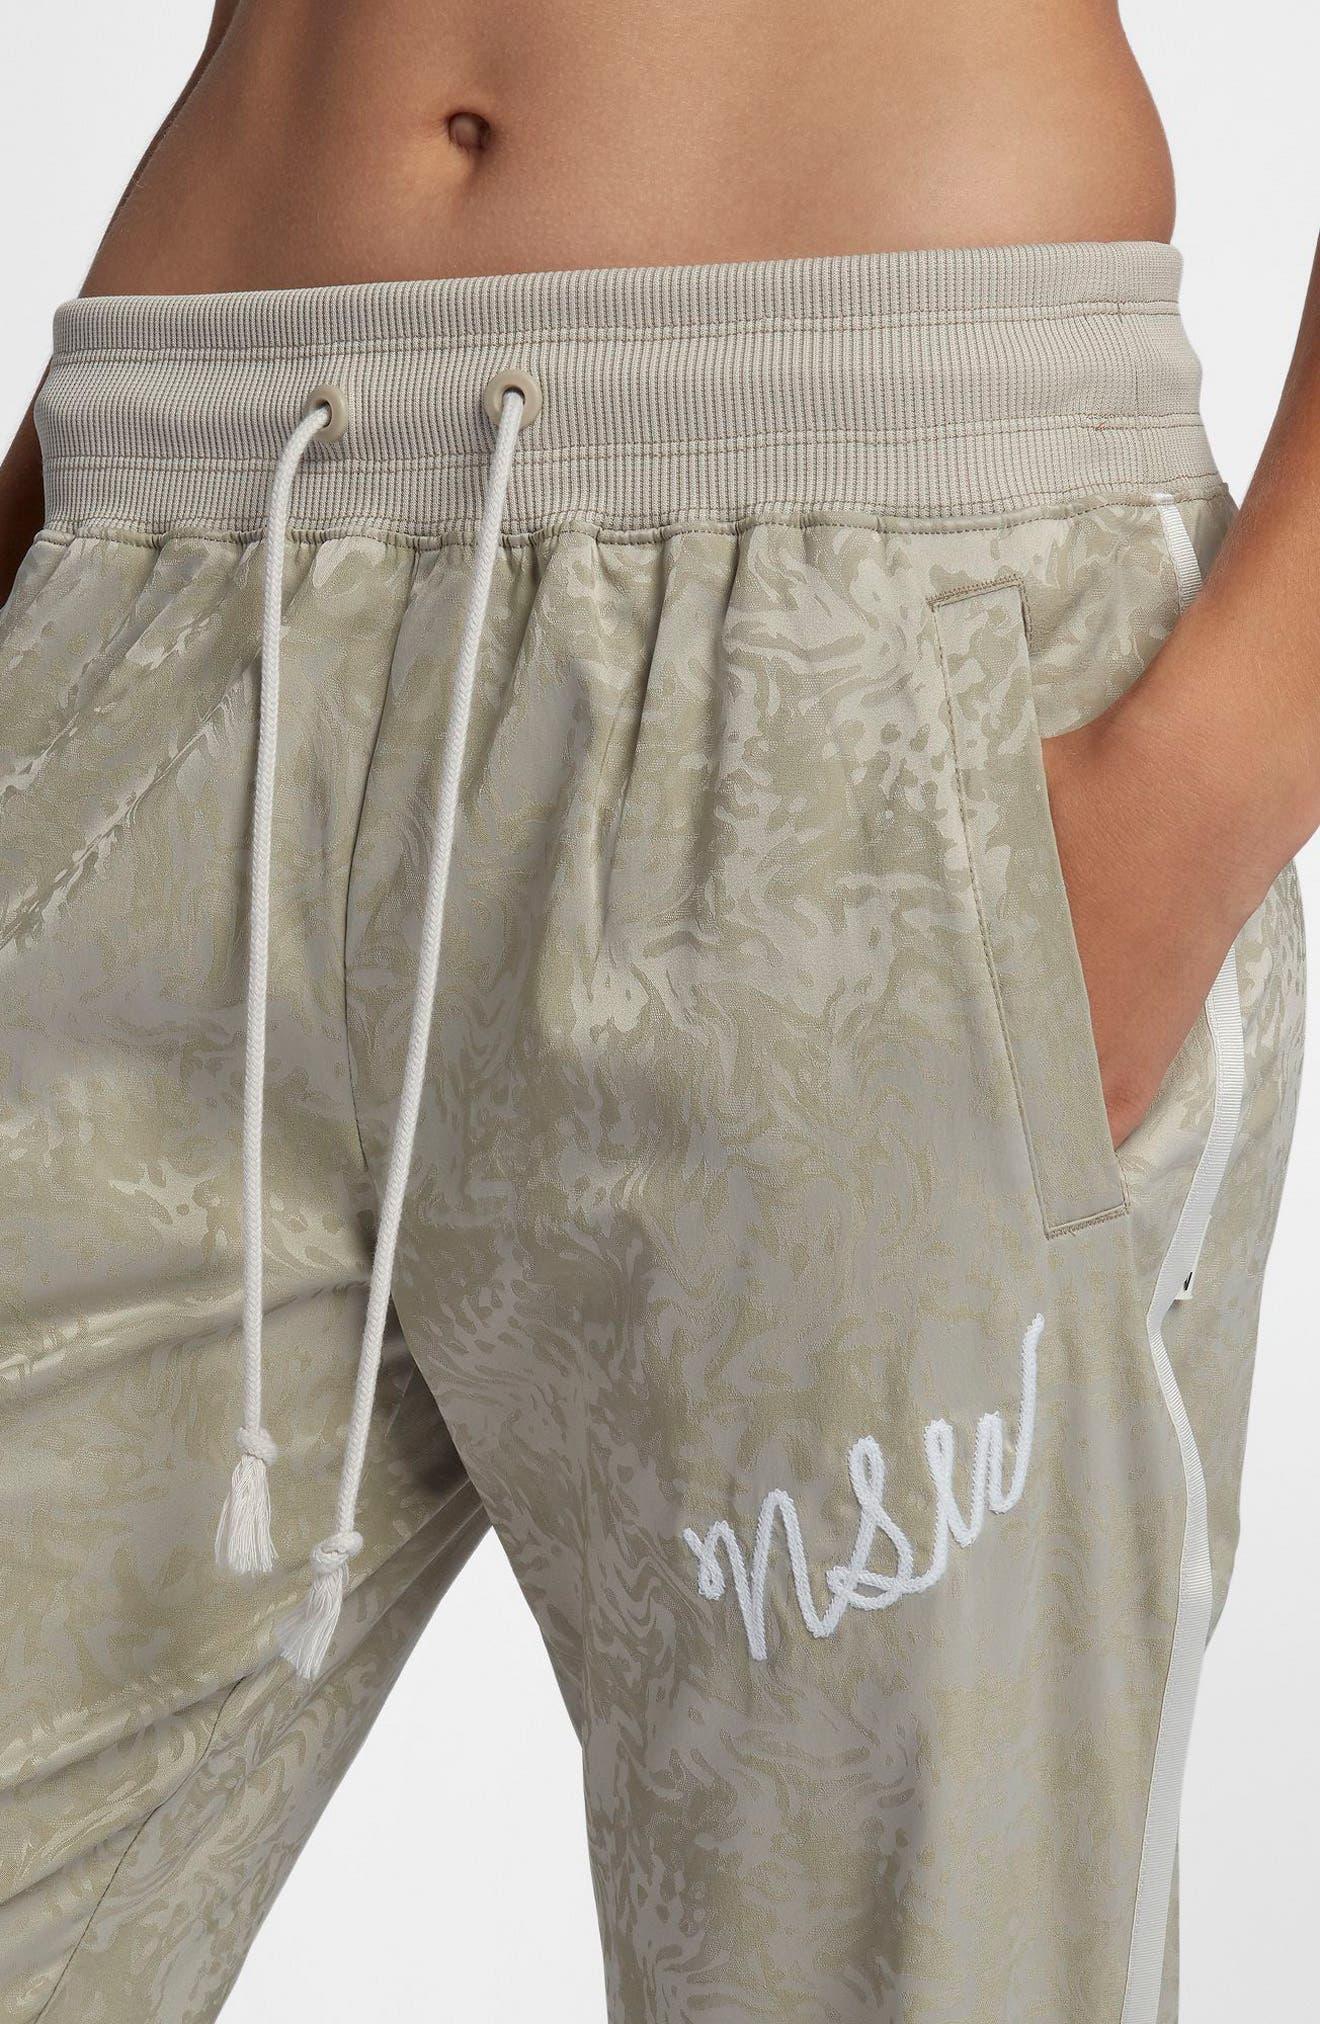 Sportswear NSW Women's Track Pants,                             Alternate thumbnail 8, color,                             201